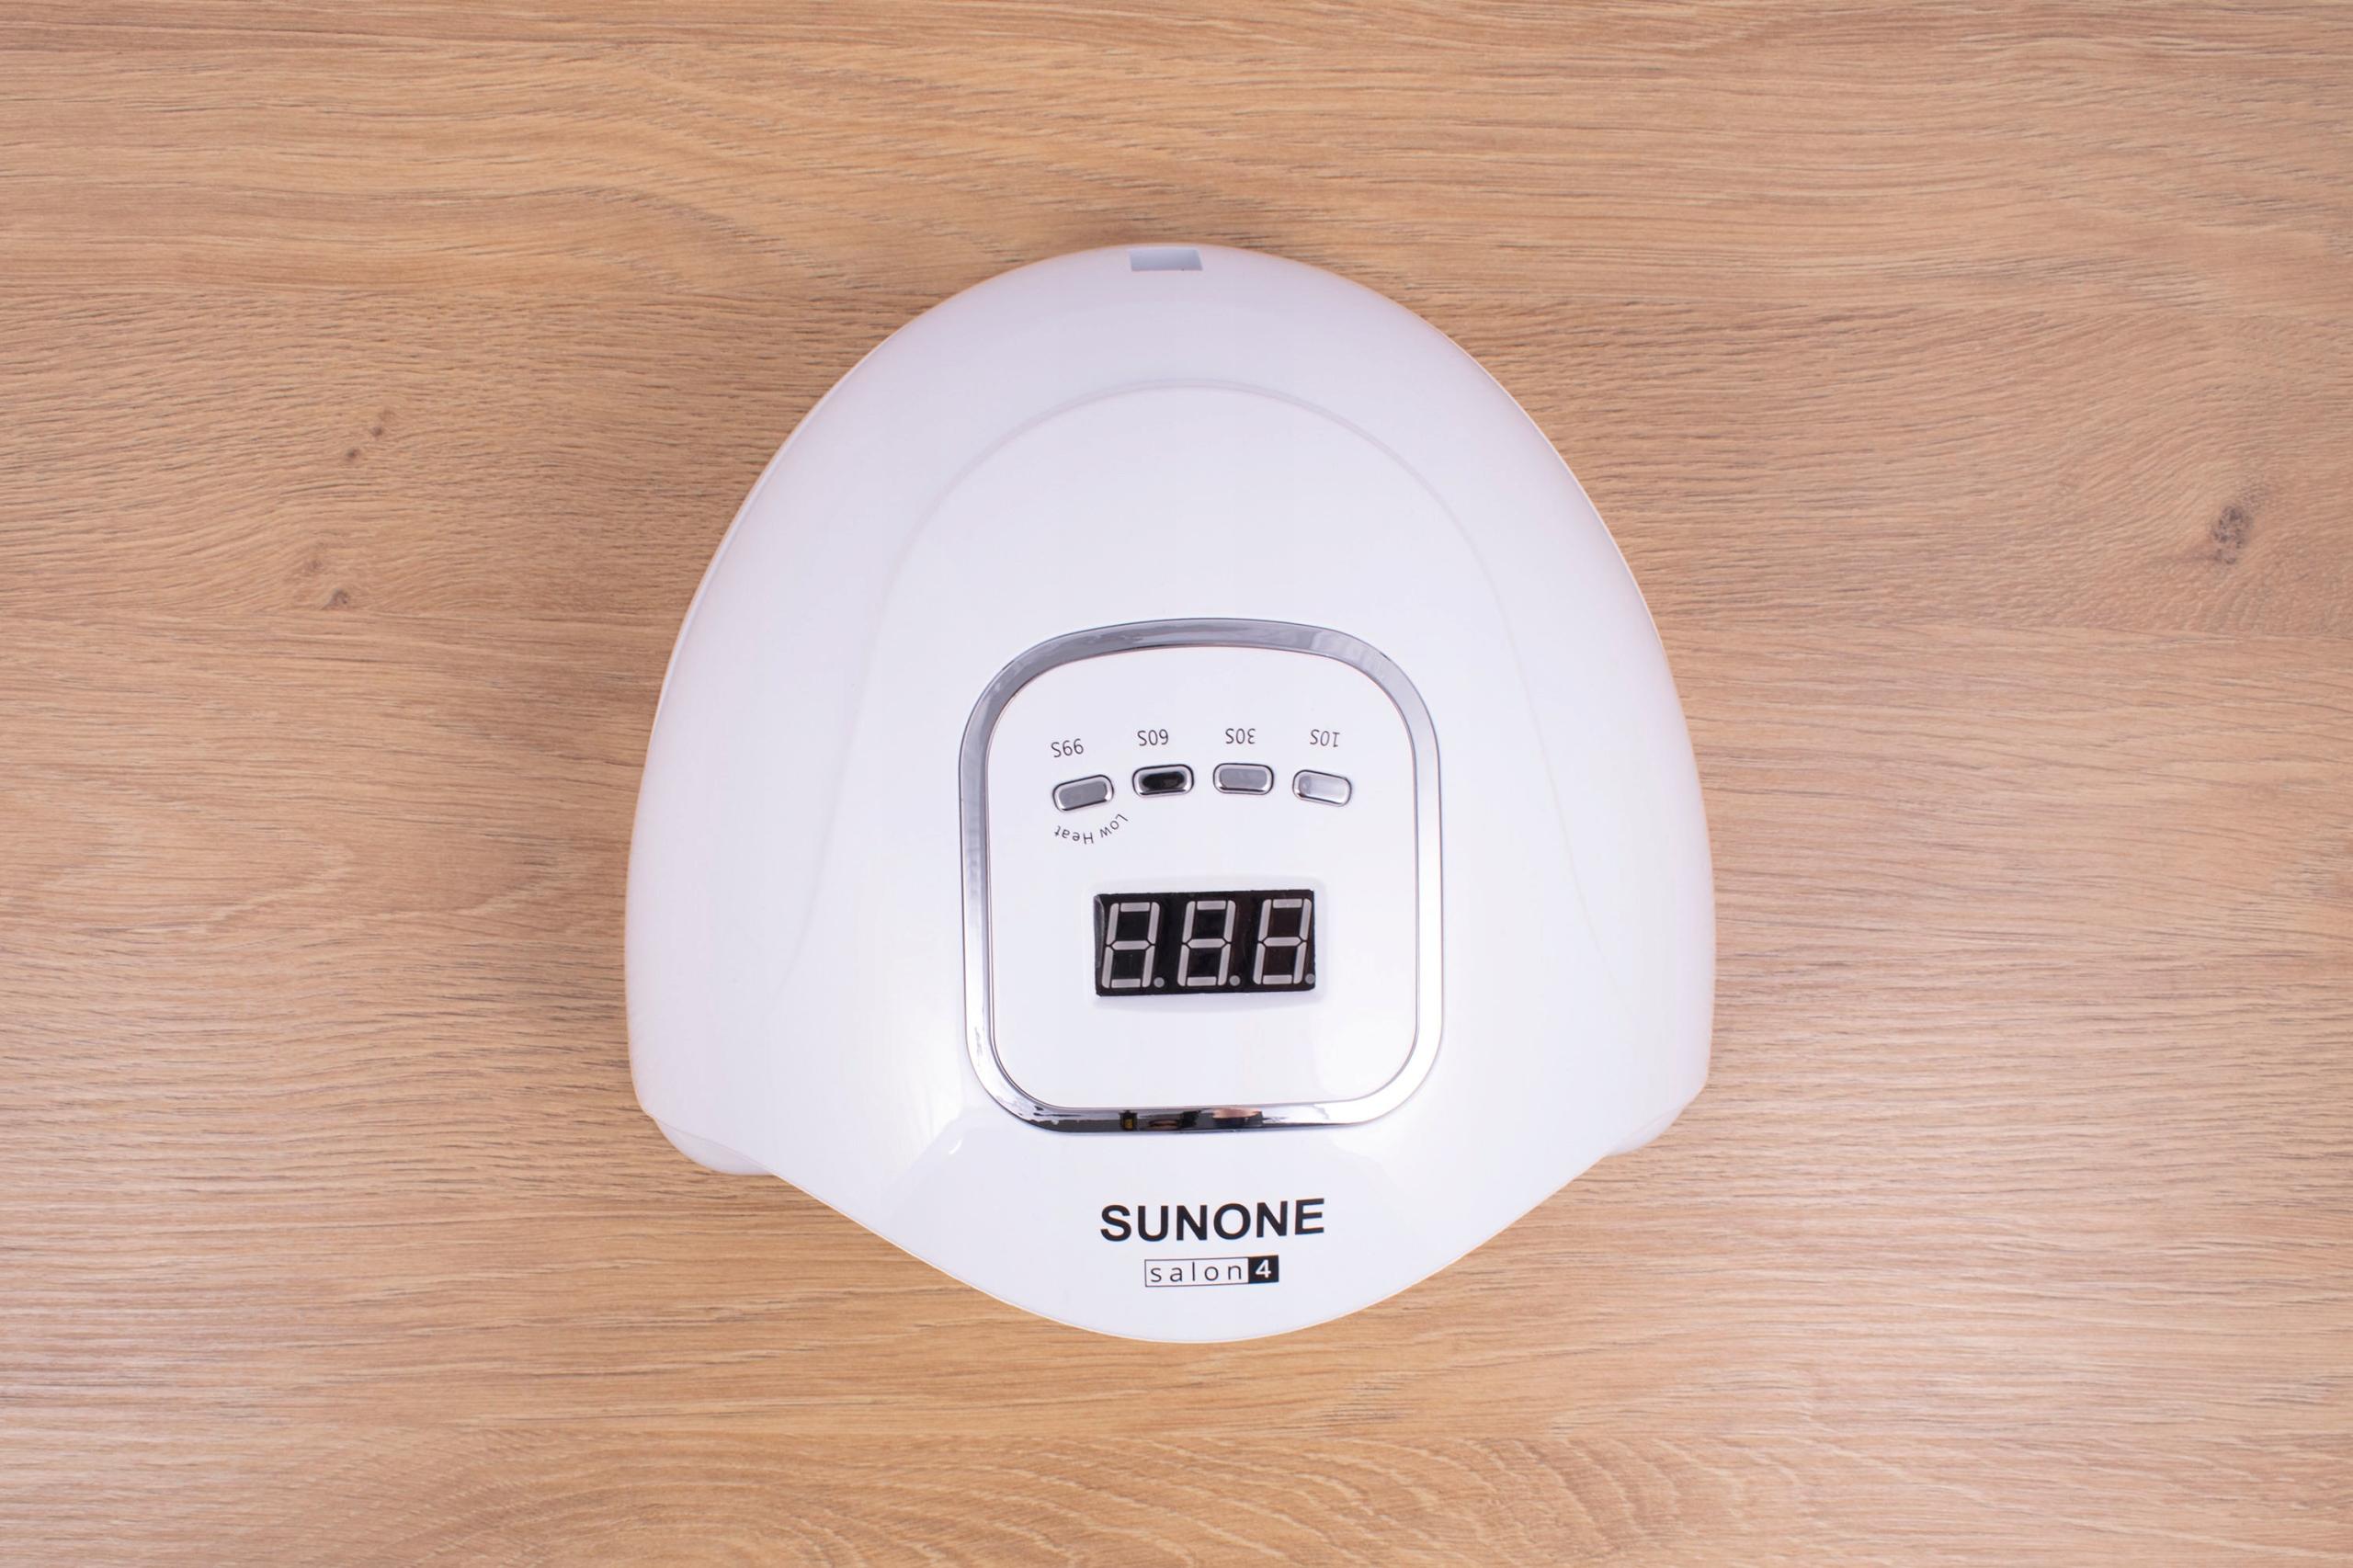 SUNONE salon4 Lampa UV LED 90W Hybrydy Żele Cechy dodatkowe sensor ruchu timer zdejmowane dno